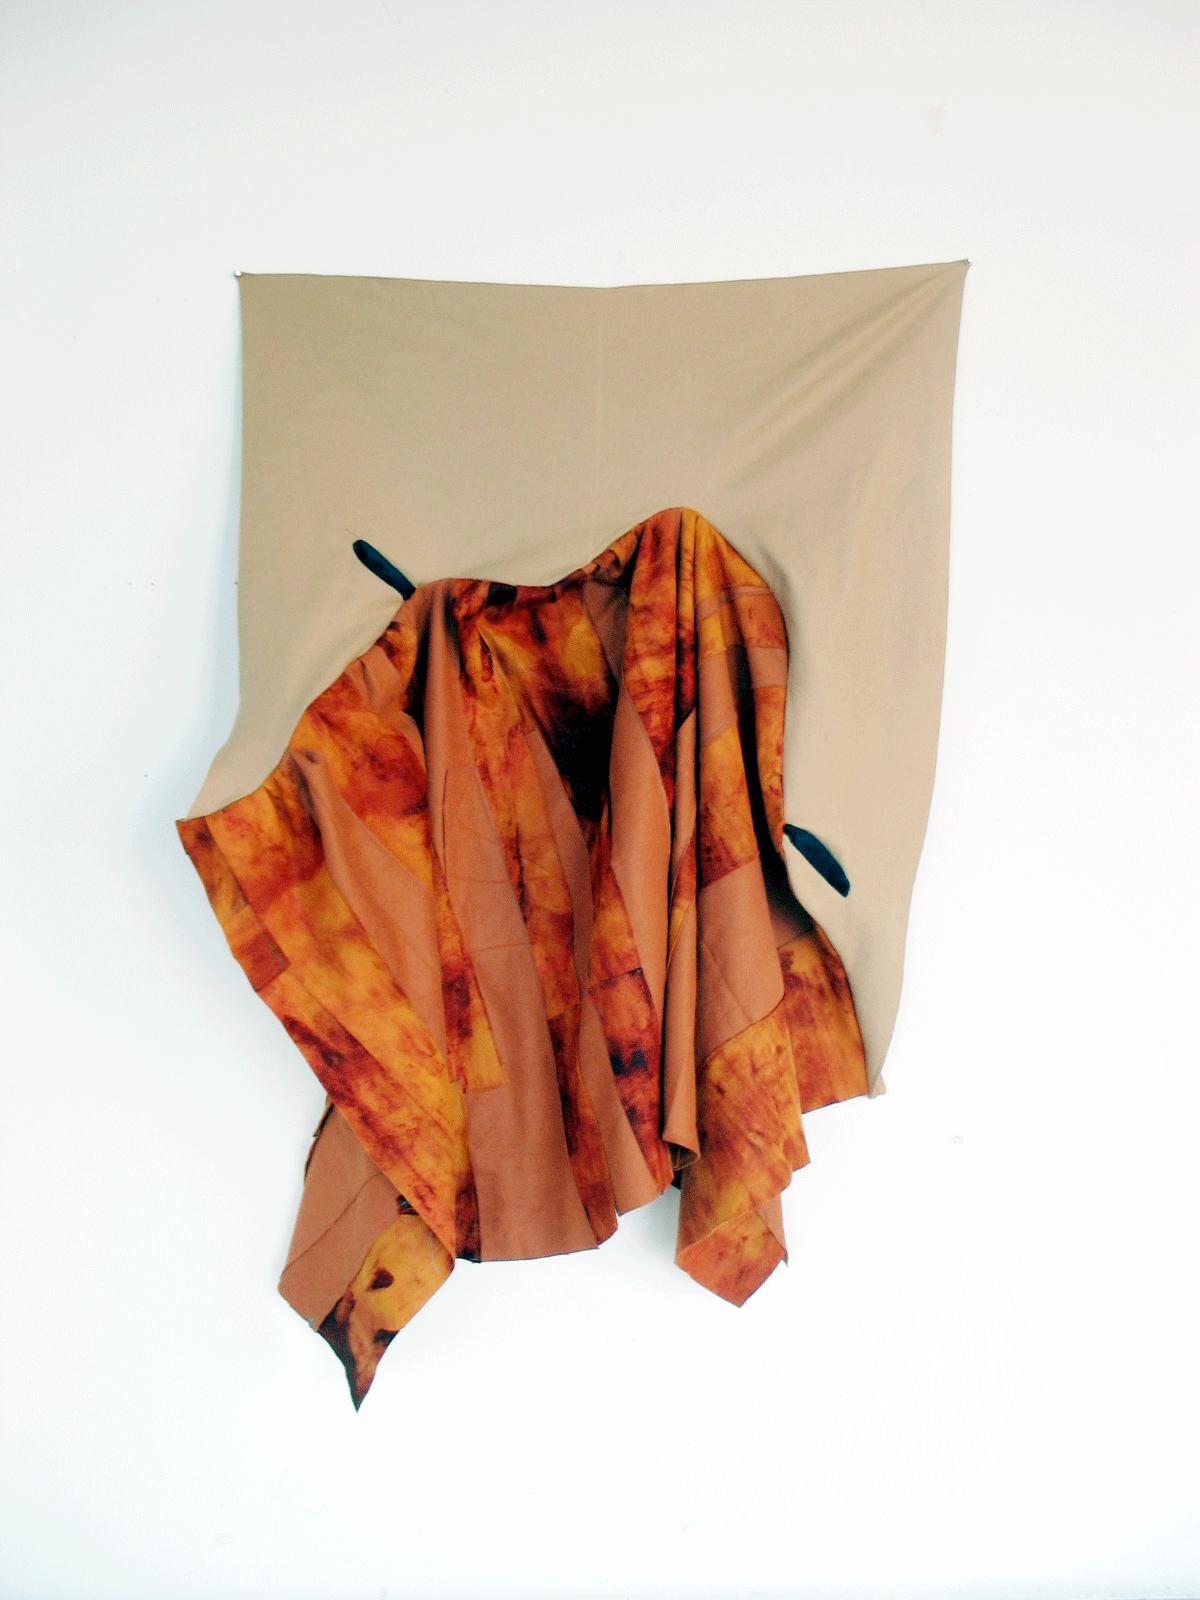 Double Negative Soft, 2004